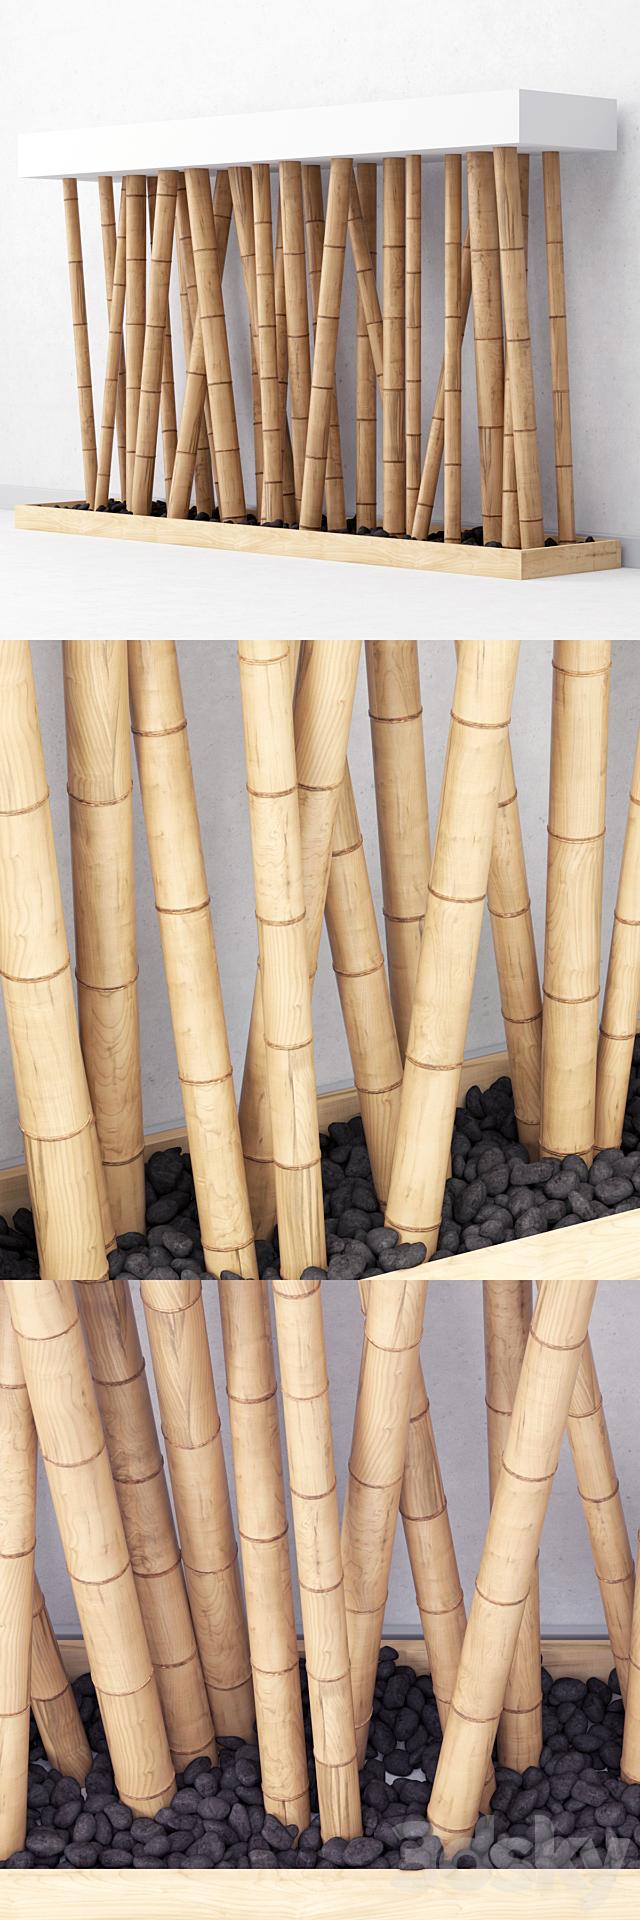 Bamboo decor №15 / Bamboo decor №15